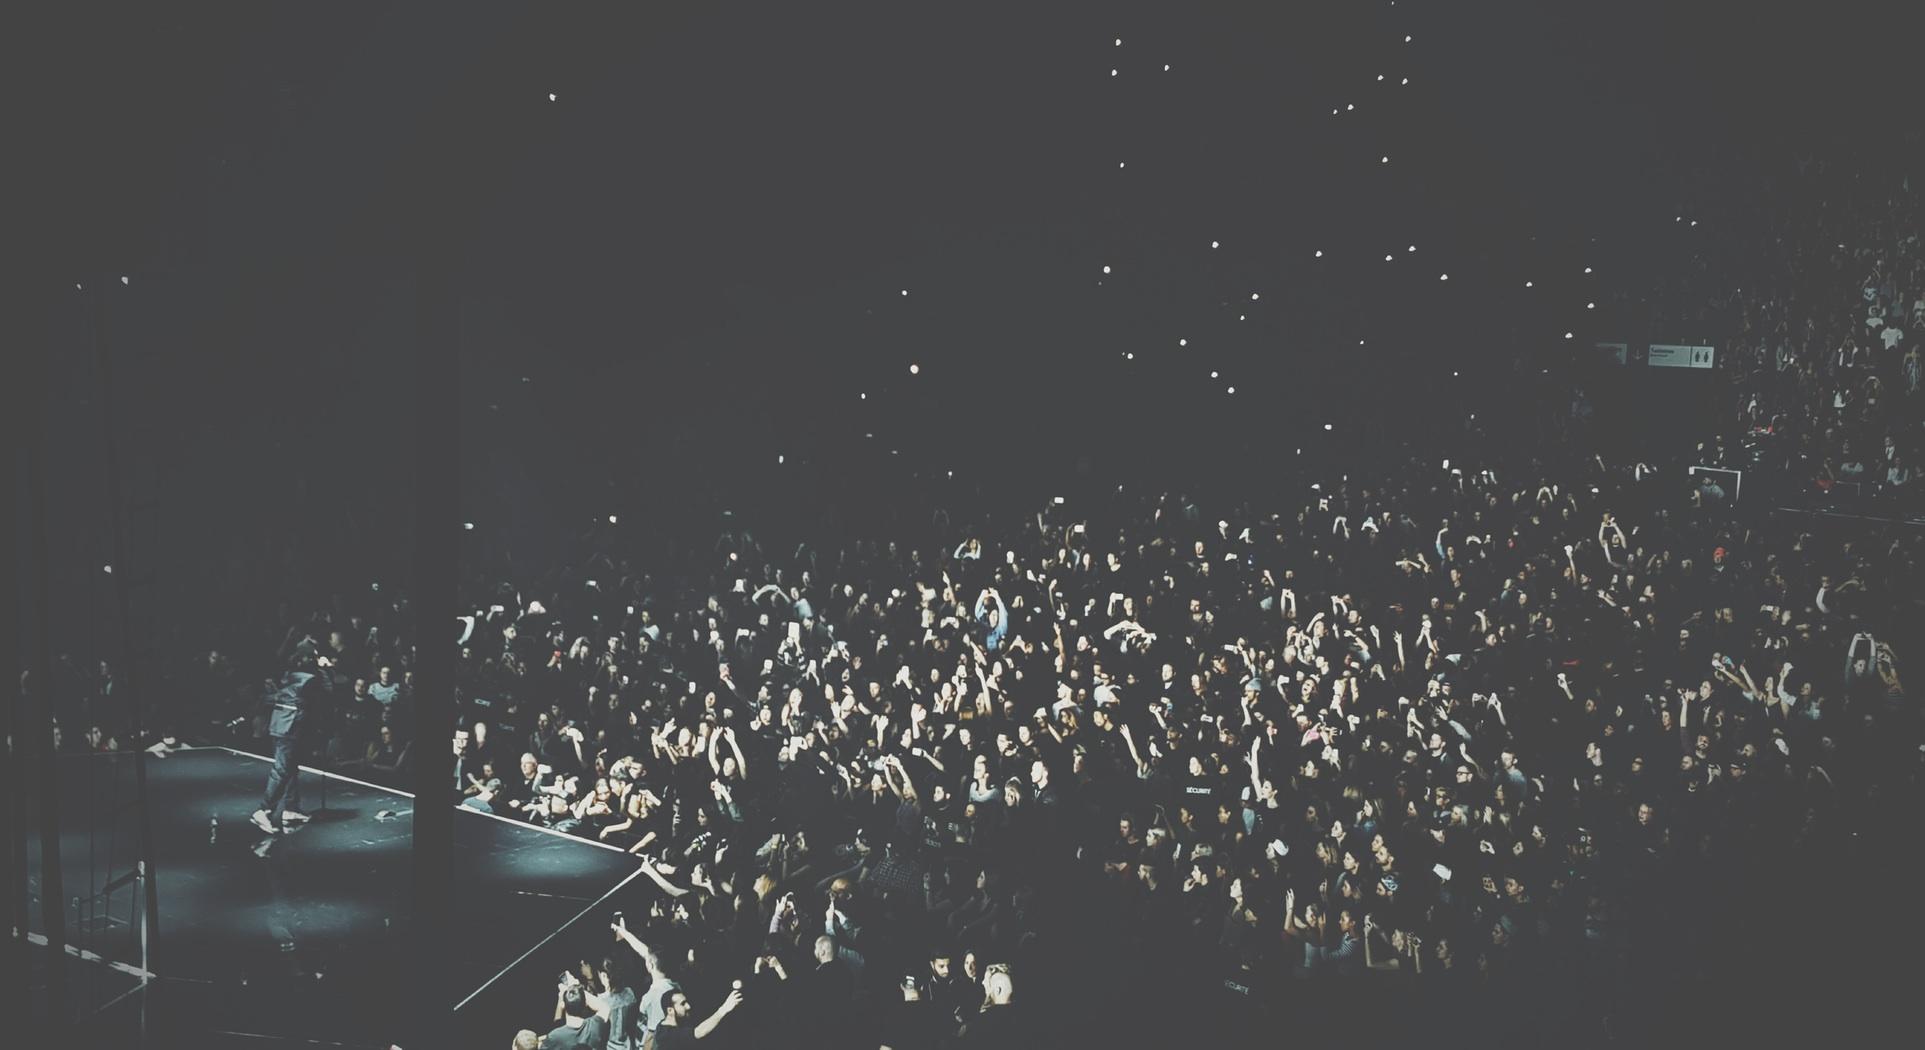 Live Crowd